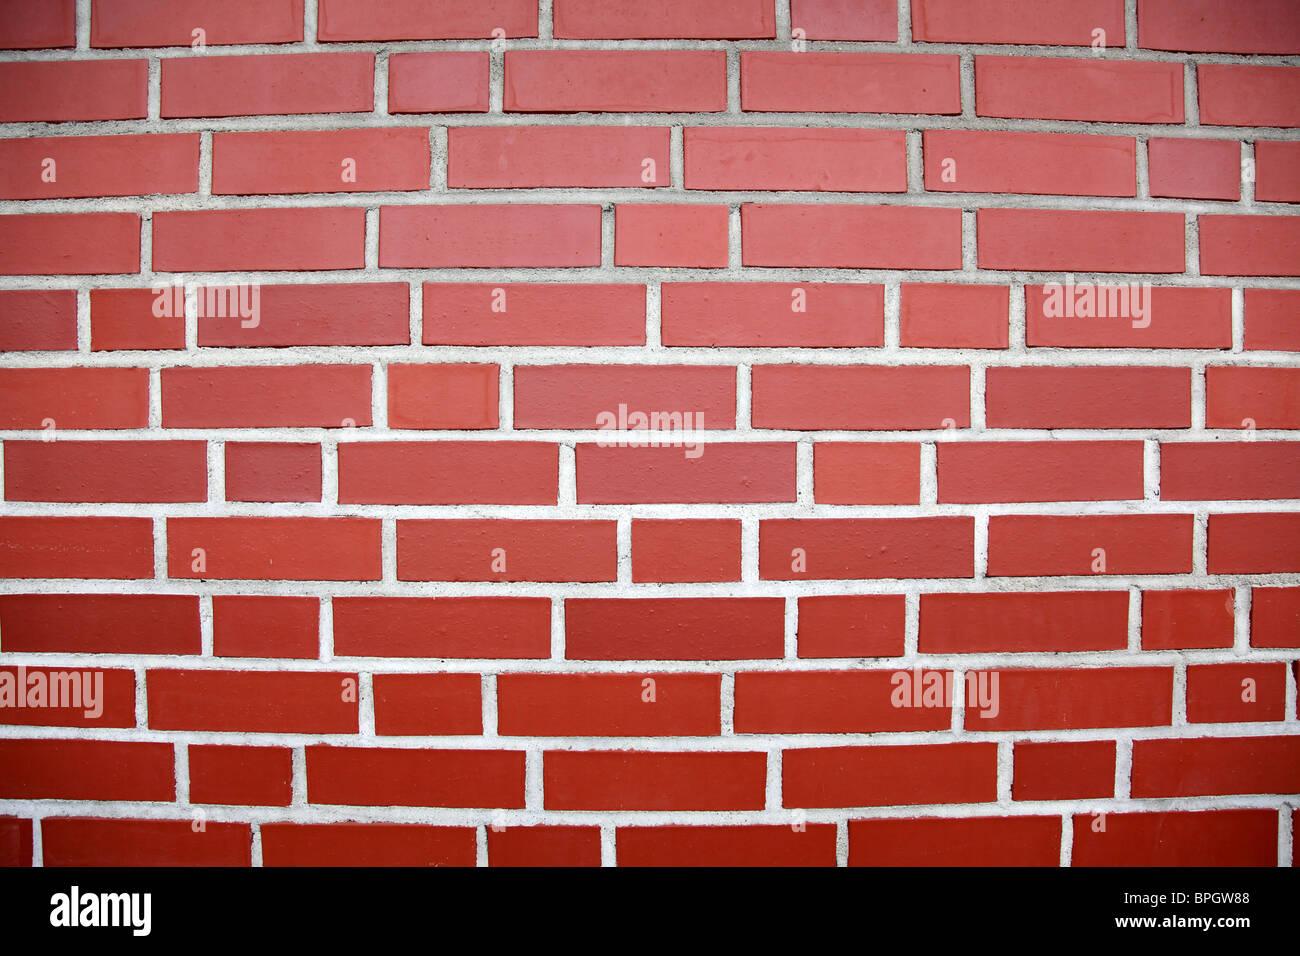 Pared de ladrillo rojo Imagen De Stock